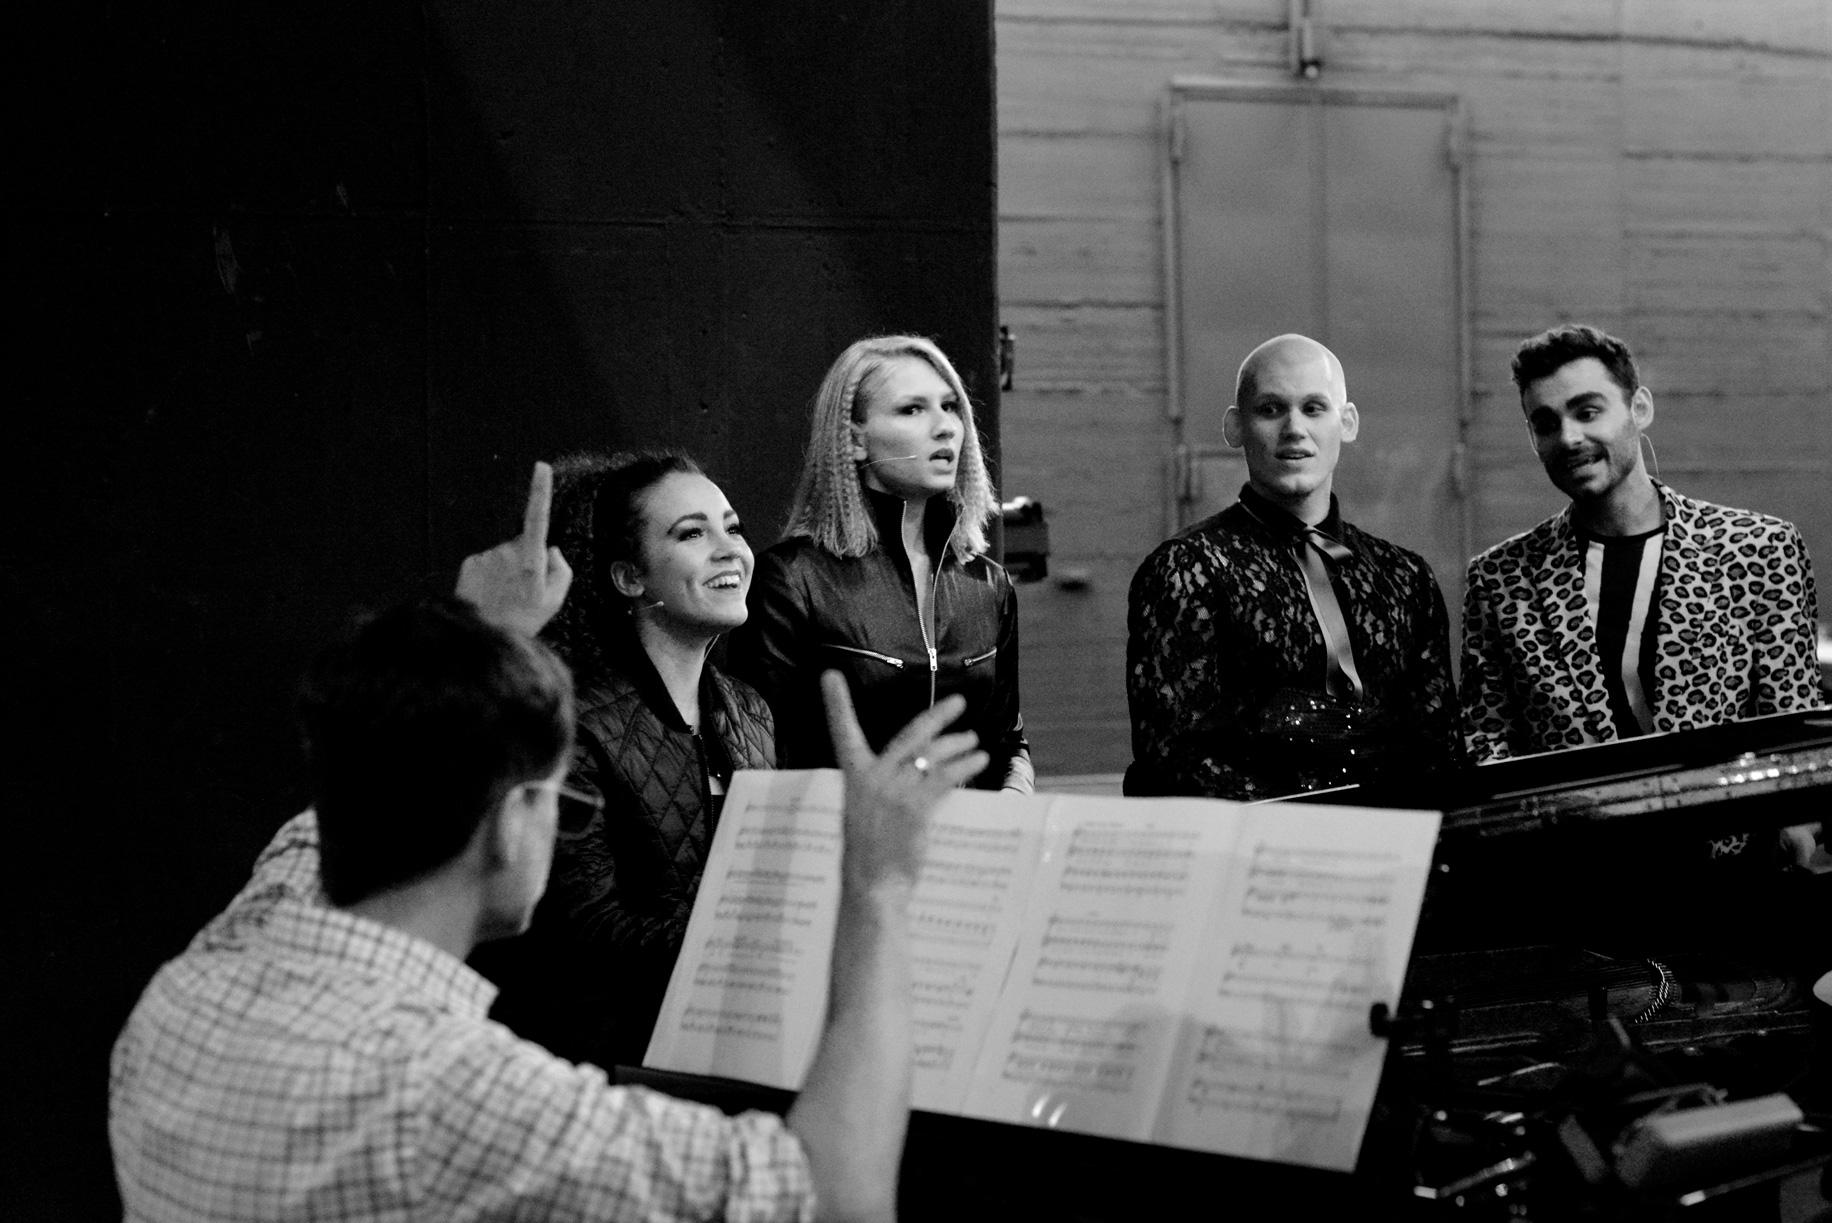 Nicola & other singers practicing